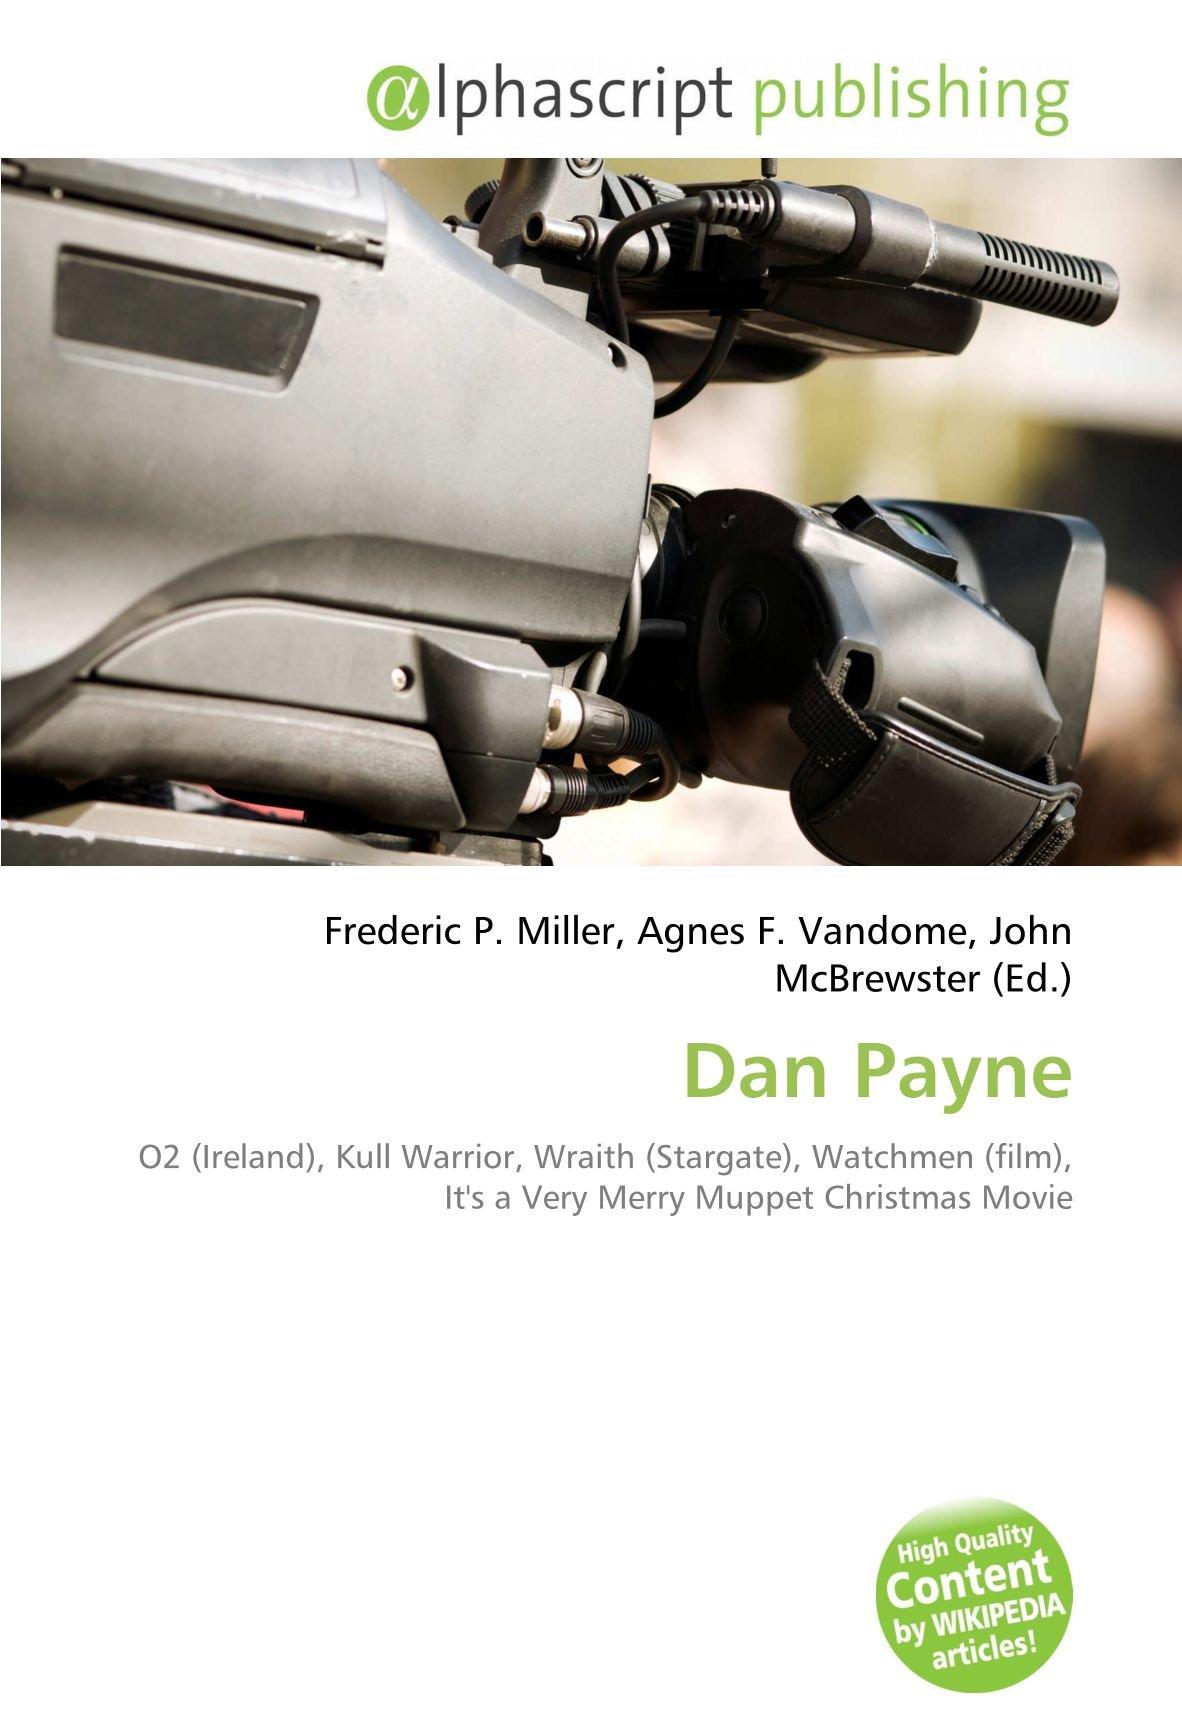 Dan Payne: O2 Ireland , Kull Warrior, Wraith Stargate , Watchmen ...